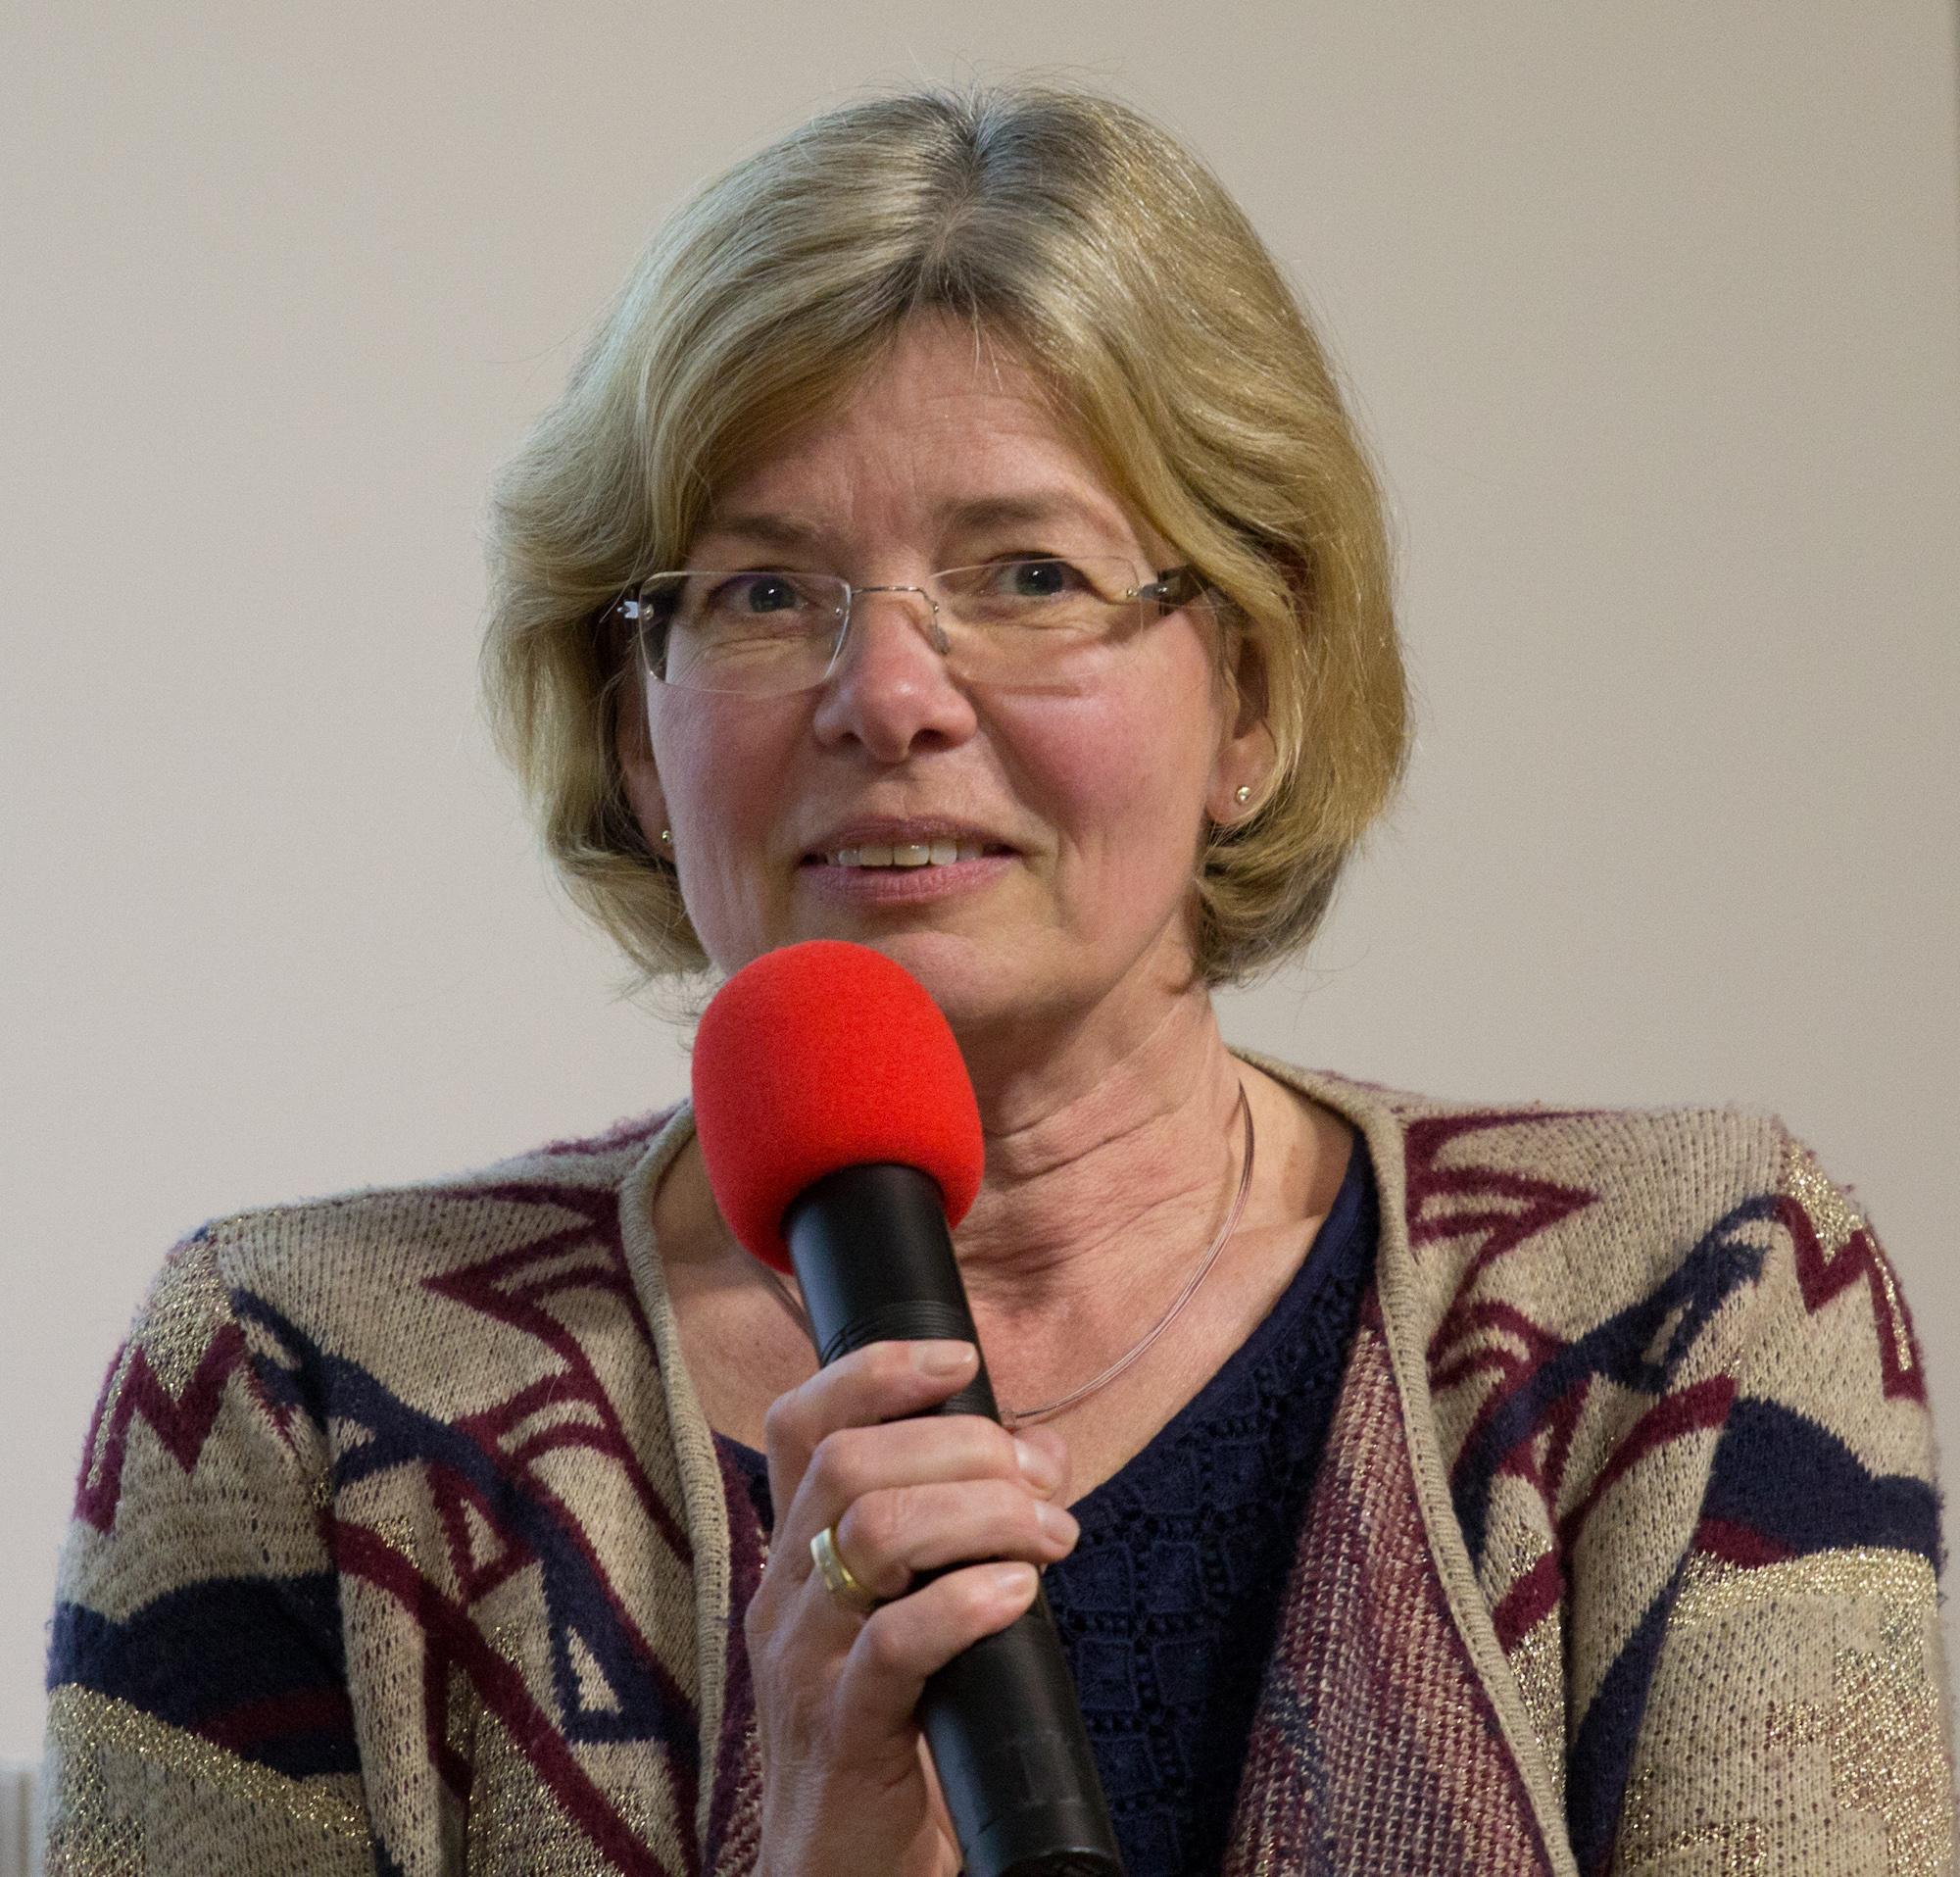 Oberregierungsbaurätin Gudrun Schmitz,  Bezirksregierung Köln (Denkmalschutz)